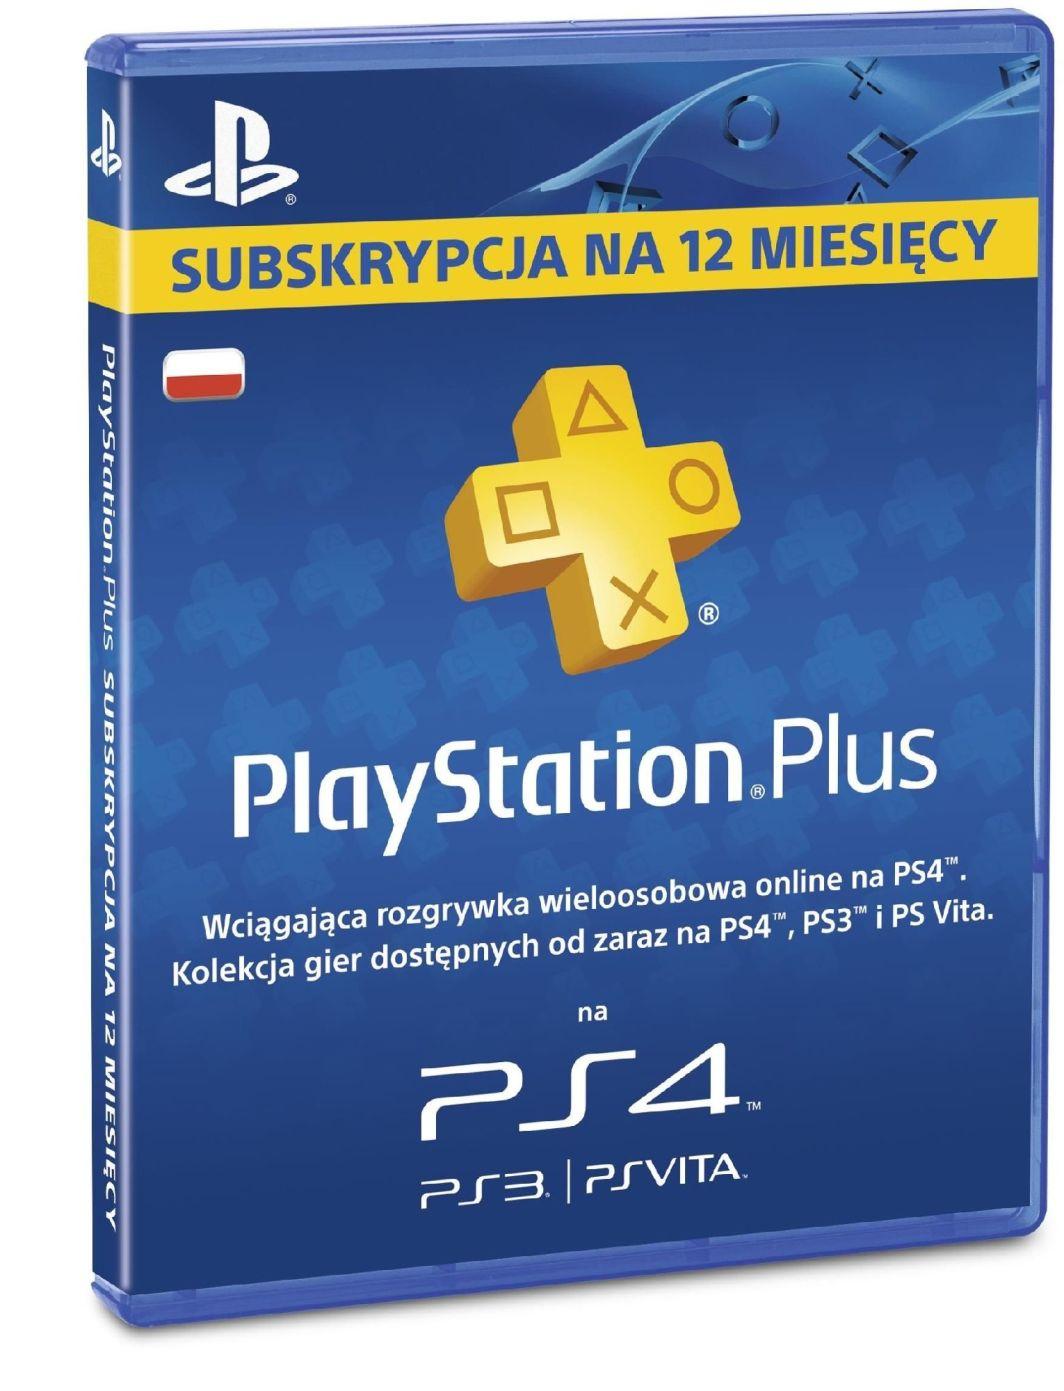 Abonament 12 miesięcy Playstation Plus 1